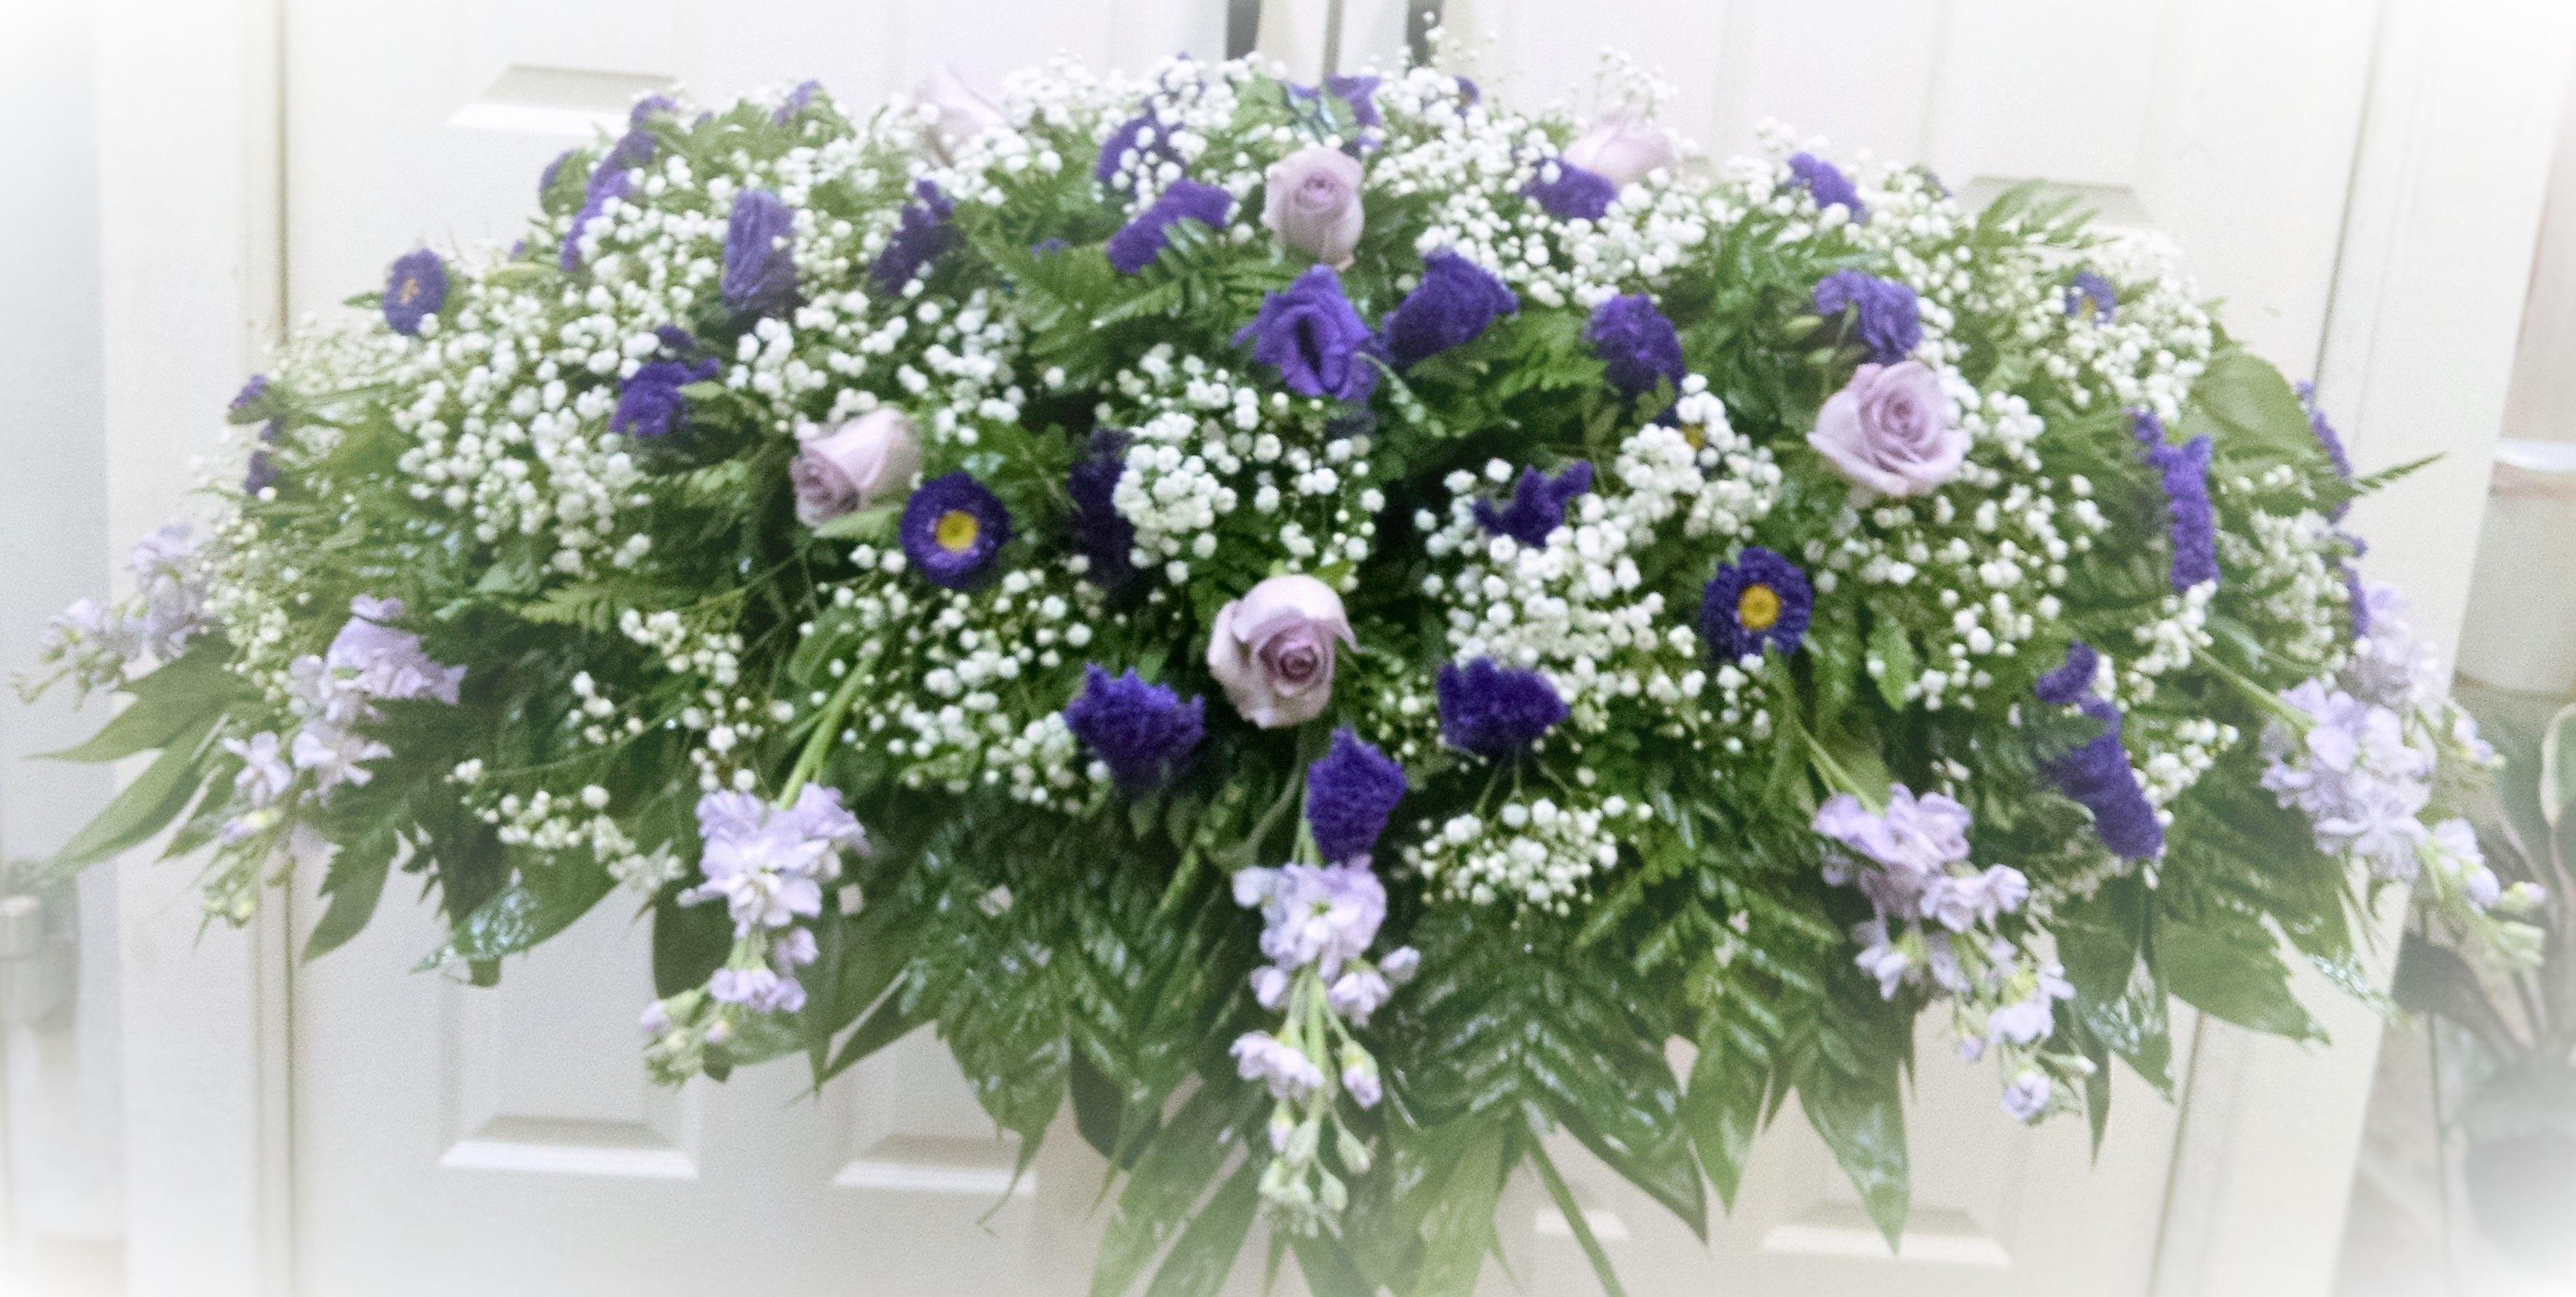 Pin by eric morgan on funeral casket flowers pinterest flowers casket flowers funeral caskets casket sprays order flowers online izmirmasajfo